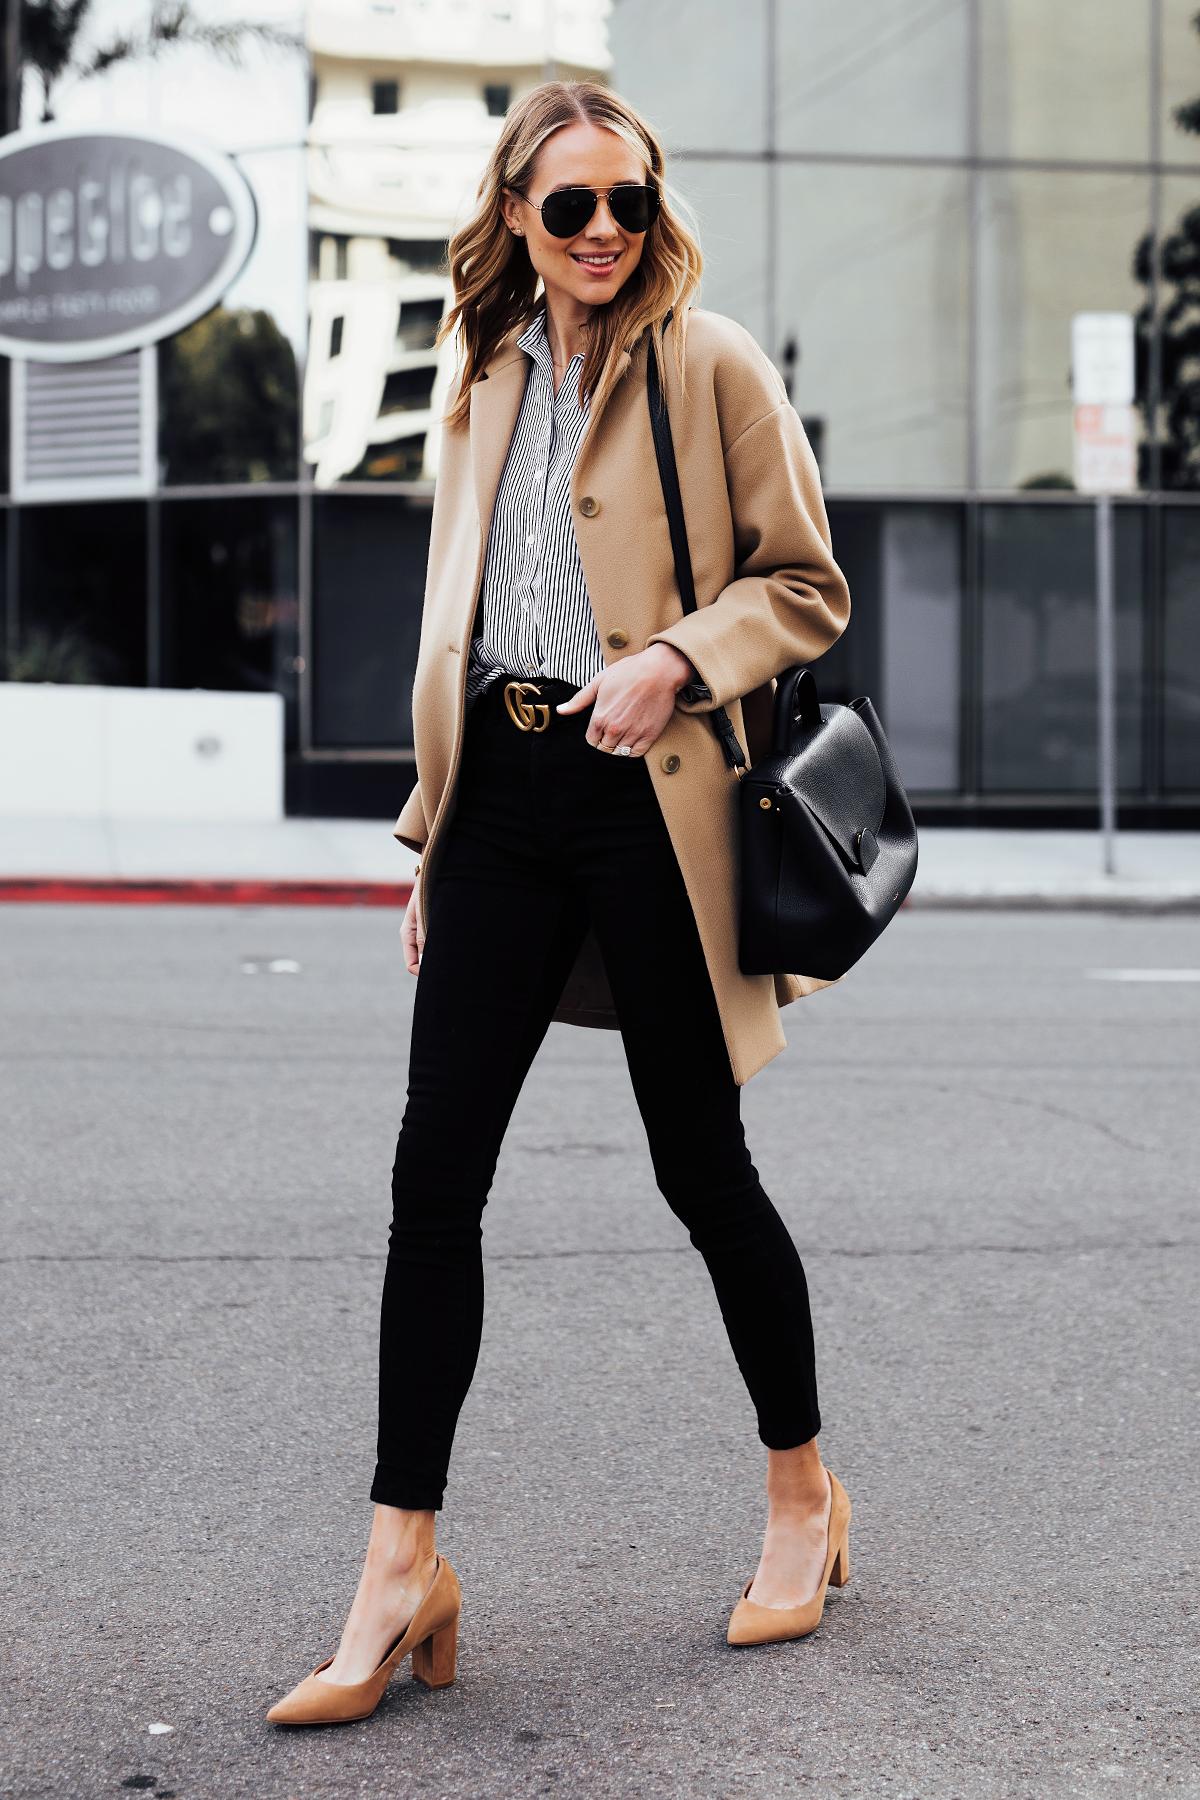 a3264516dae Blonde Woman Wearing Everlane Camel Coat Black White Stripe Button Down  Shirt Black Skinny Jeans Black